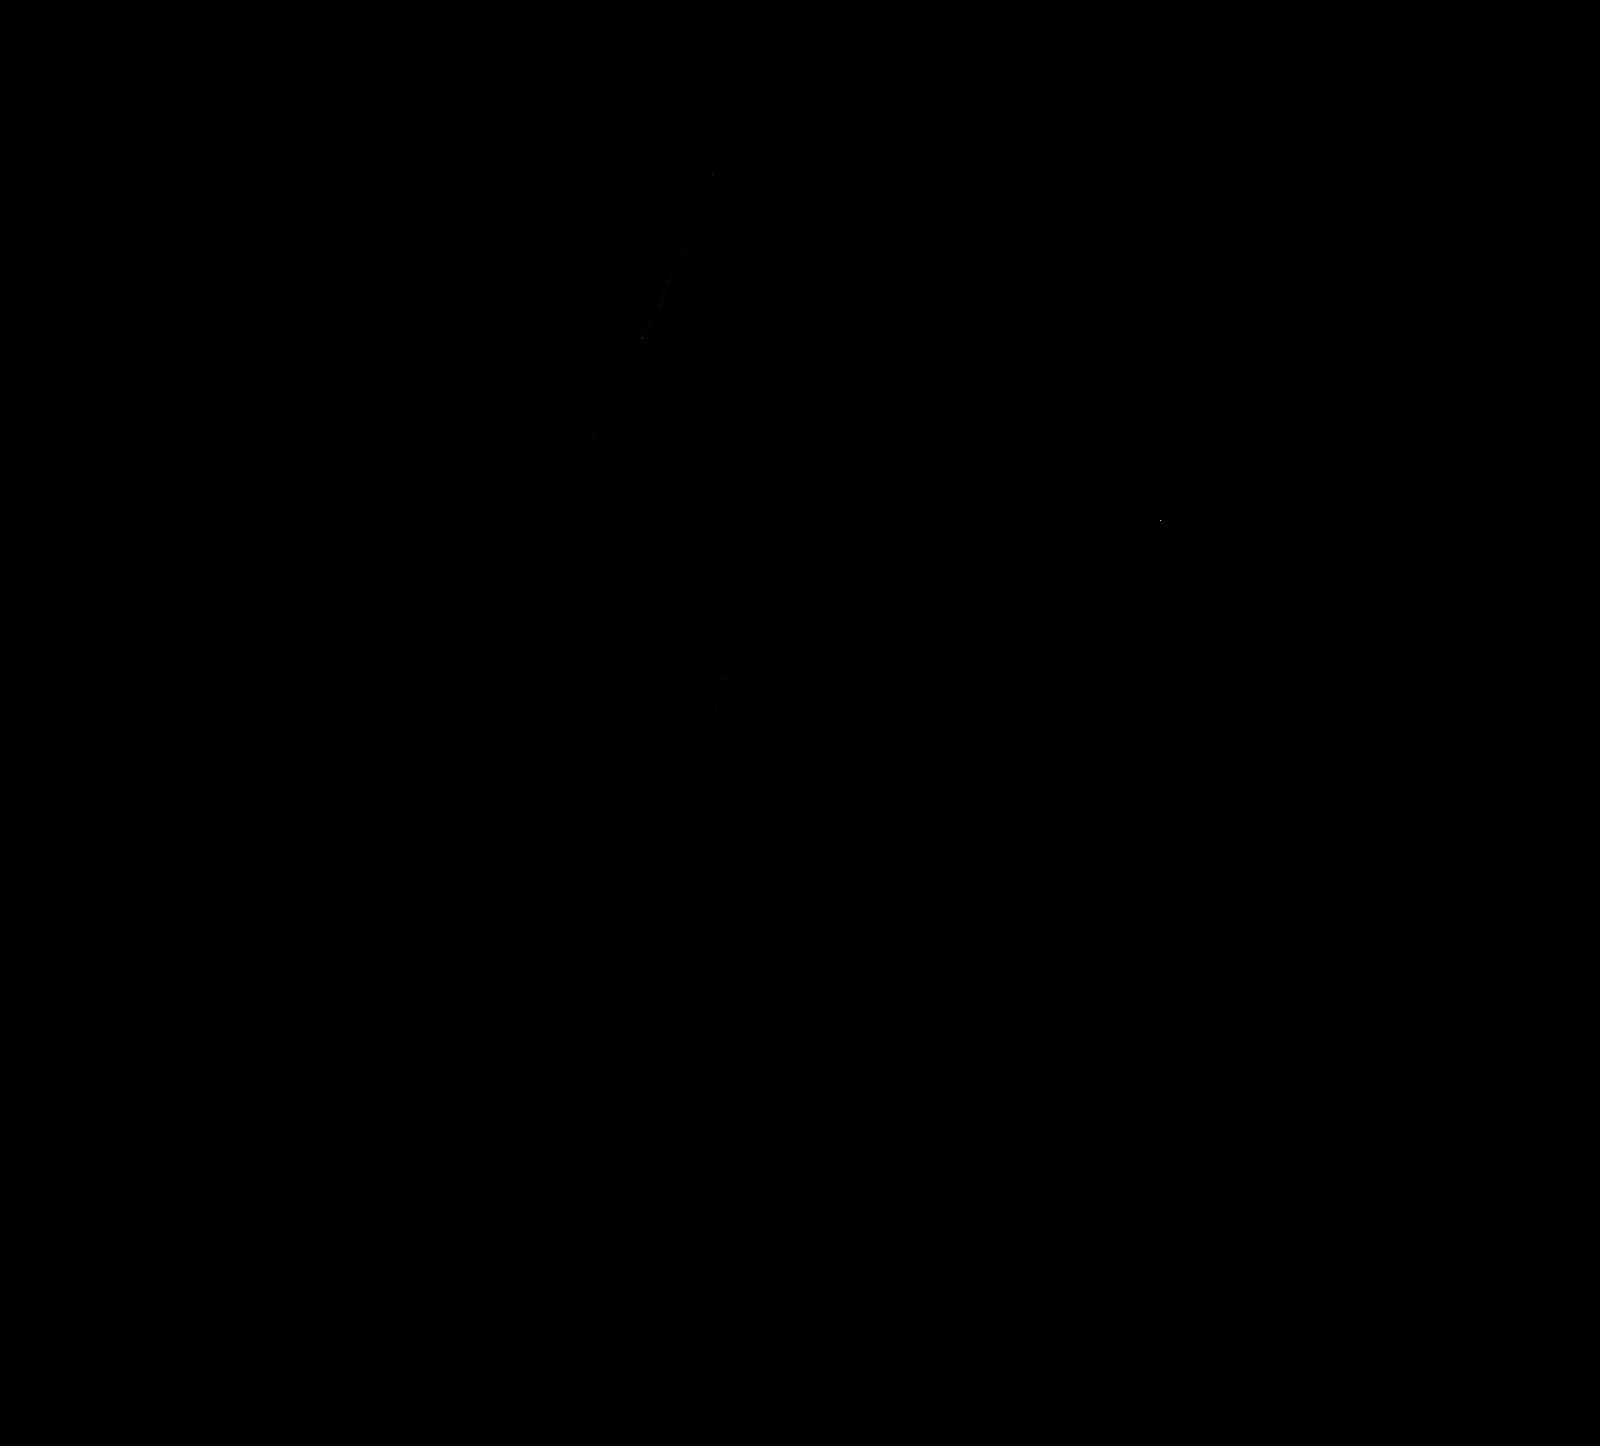 escala de grises